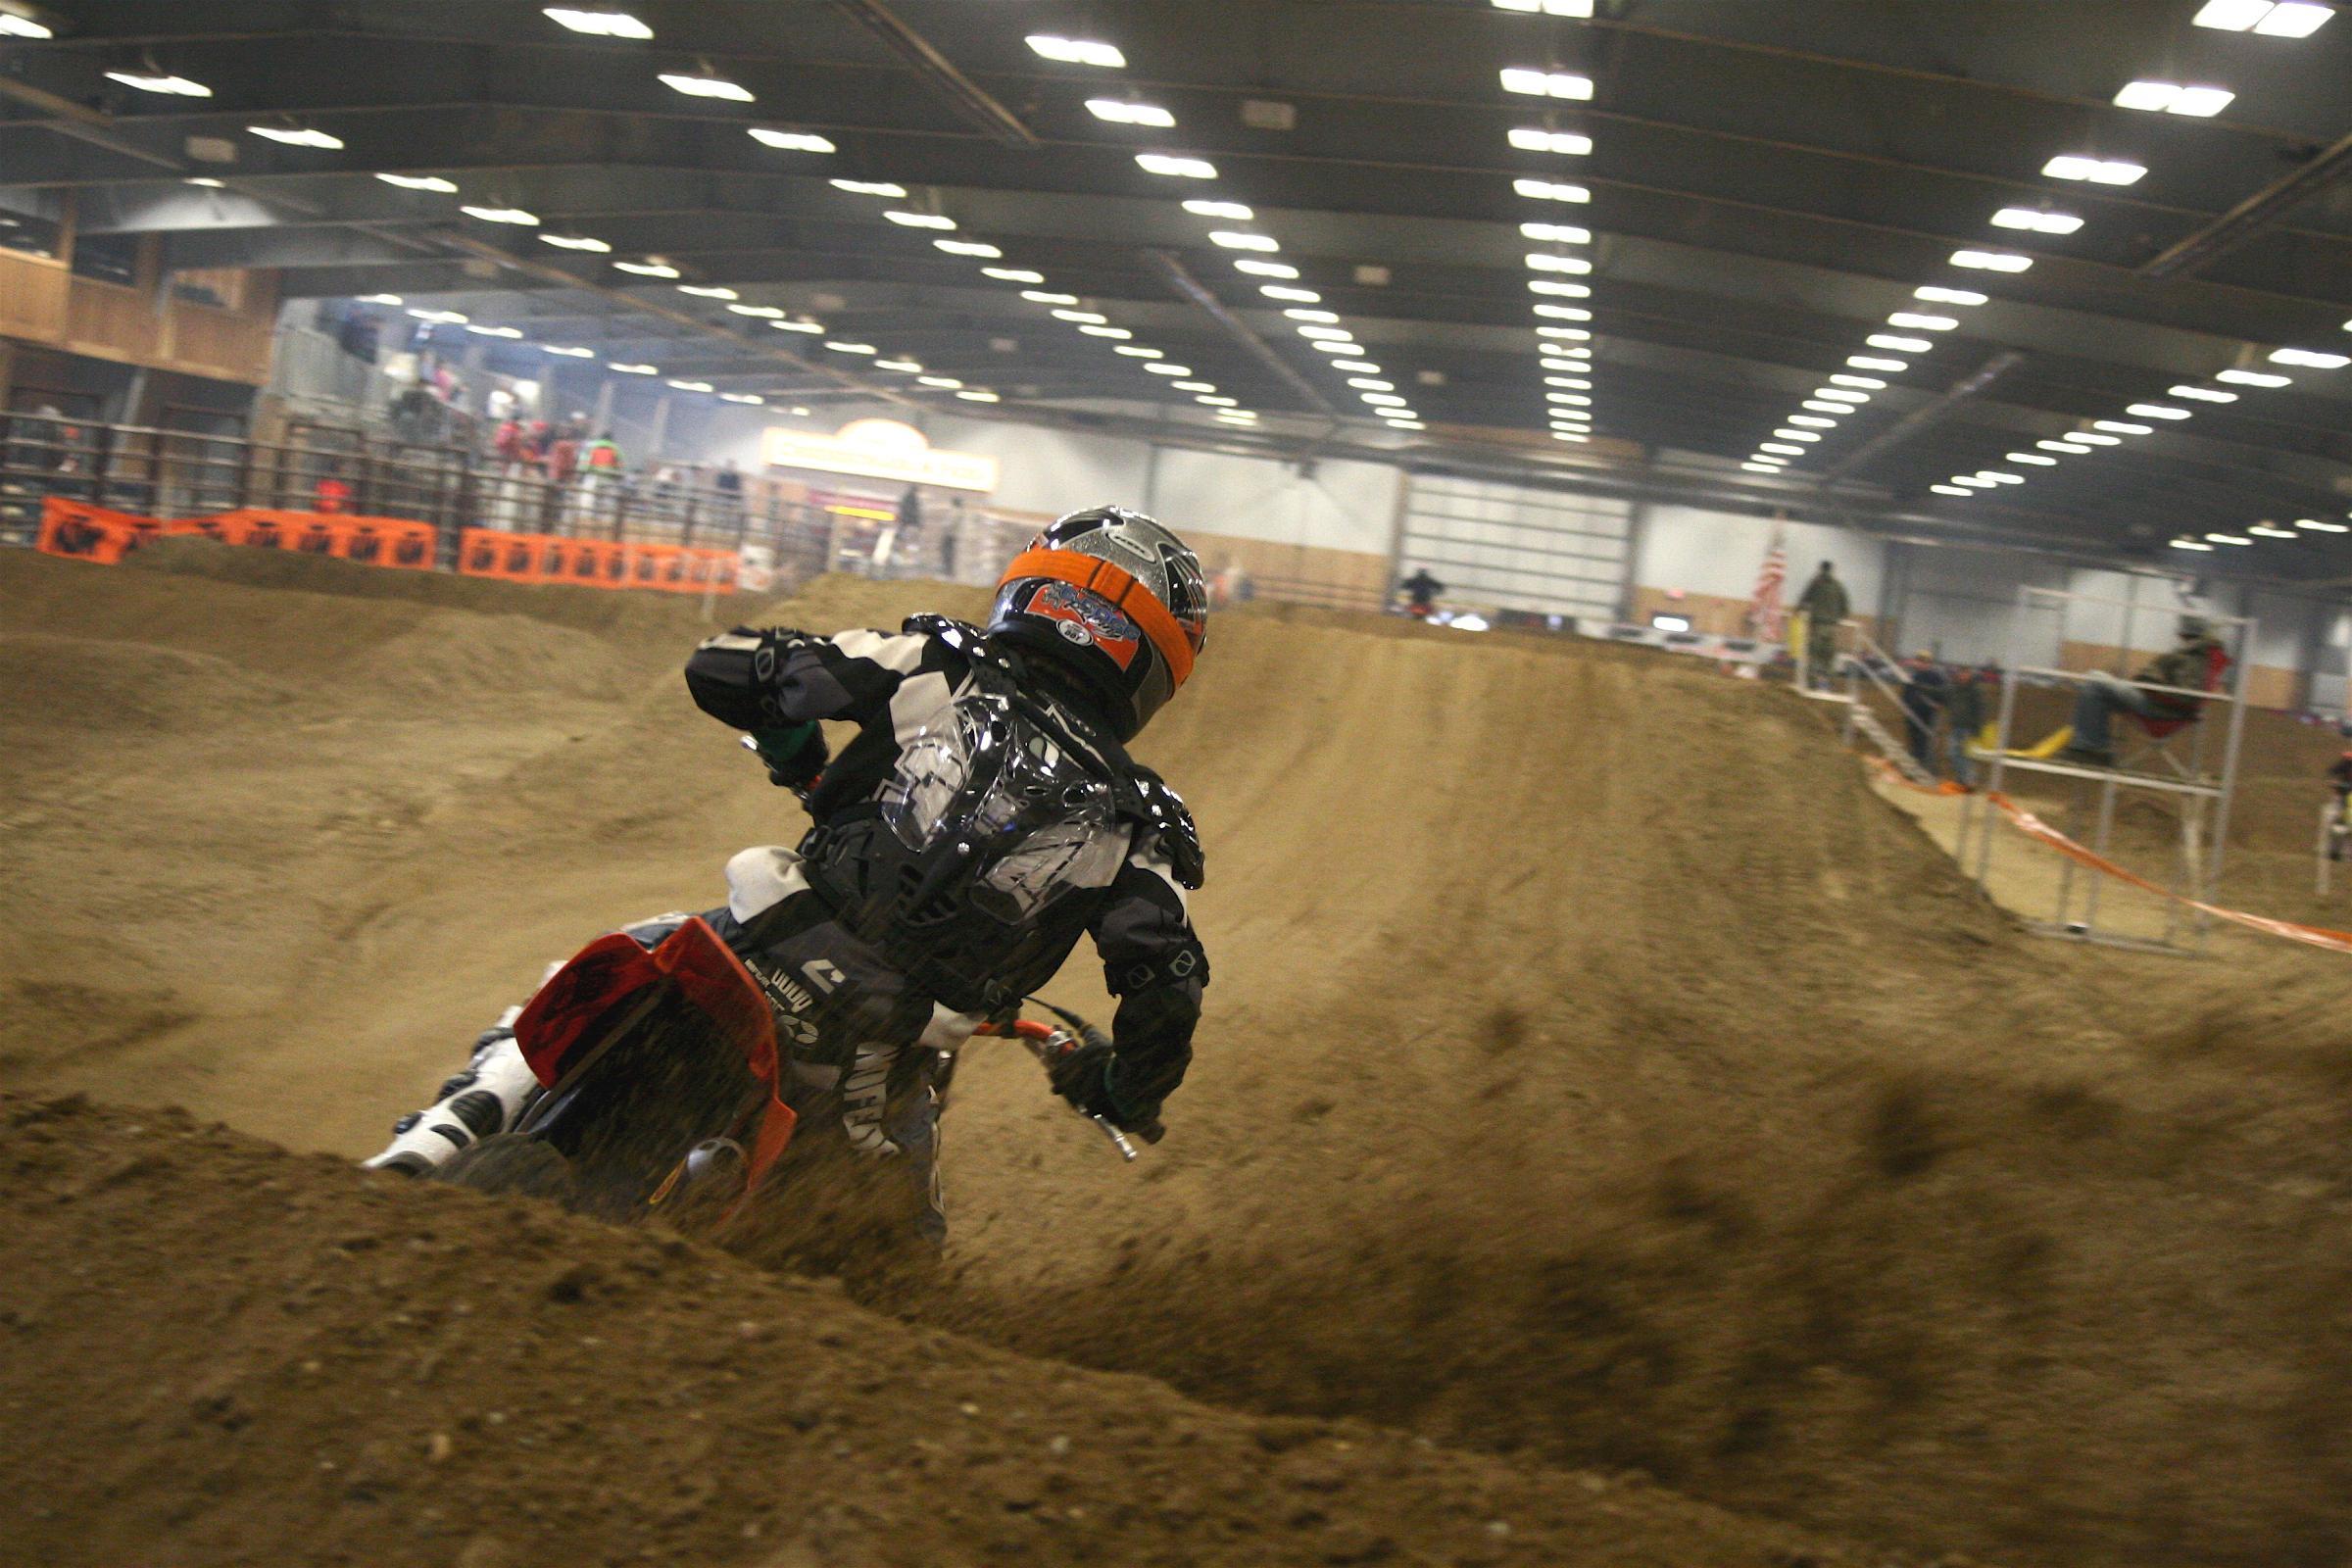 ktm sx 125 race fans motocross wallpaper 2400x1600